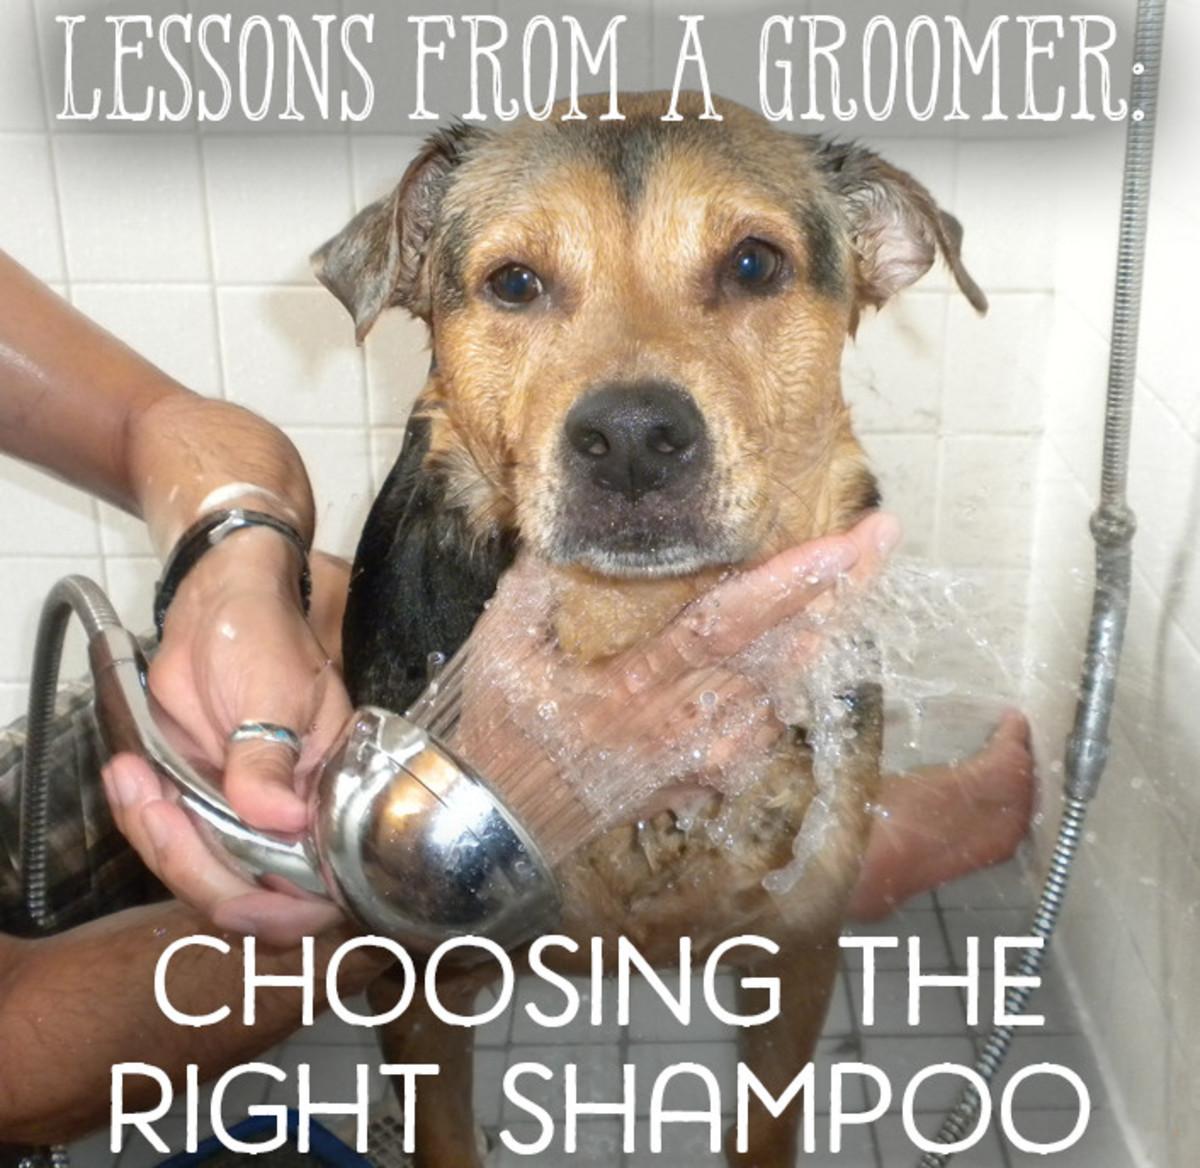 How to Choose the Best Dog Shampoo (For Fleas, Dandruff